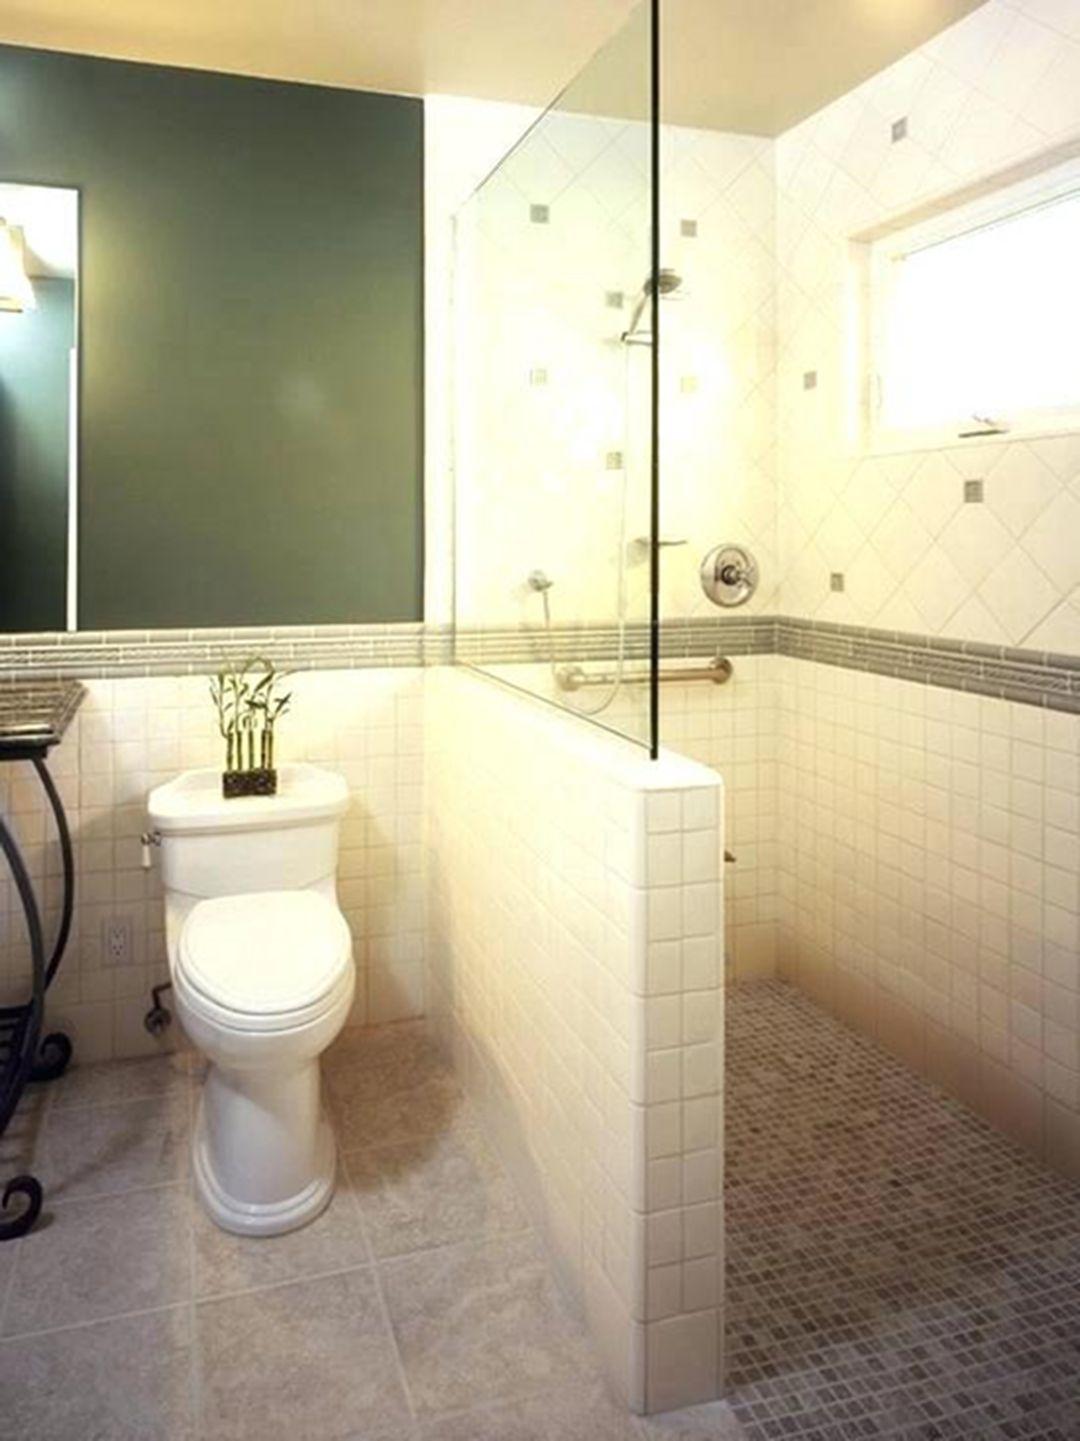 13 Fantastic Small Bathroom Design With Shower Ideas Small